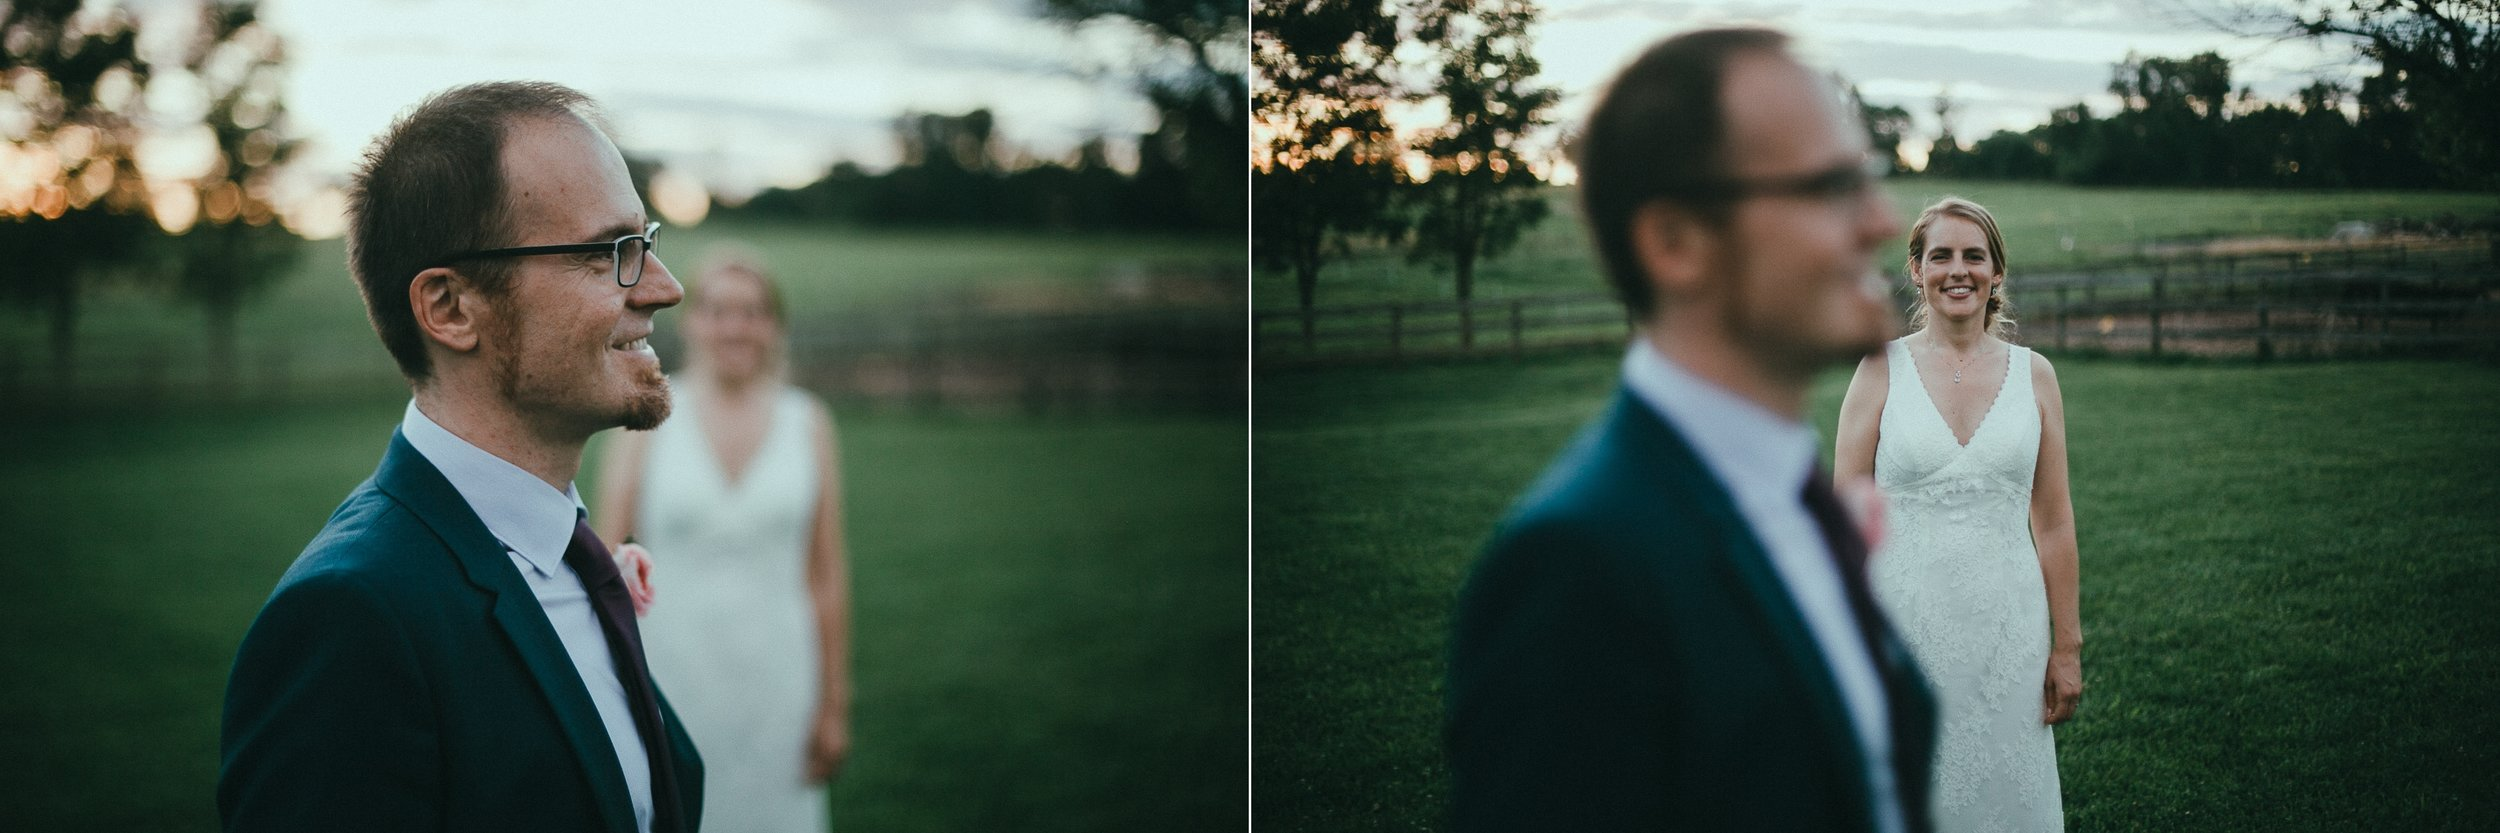 washington-wedding-photographer (68).jpg